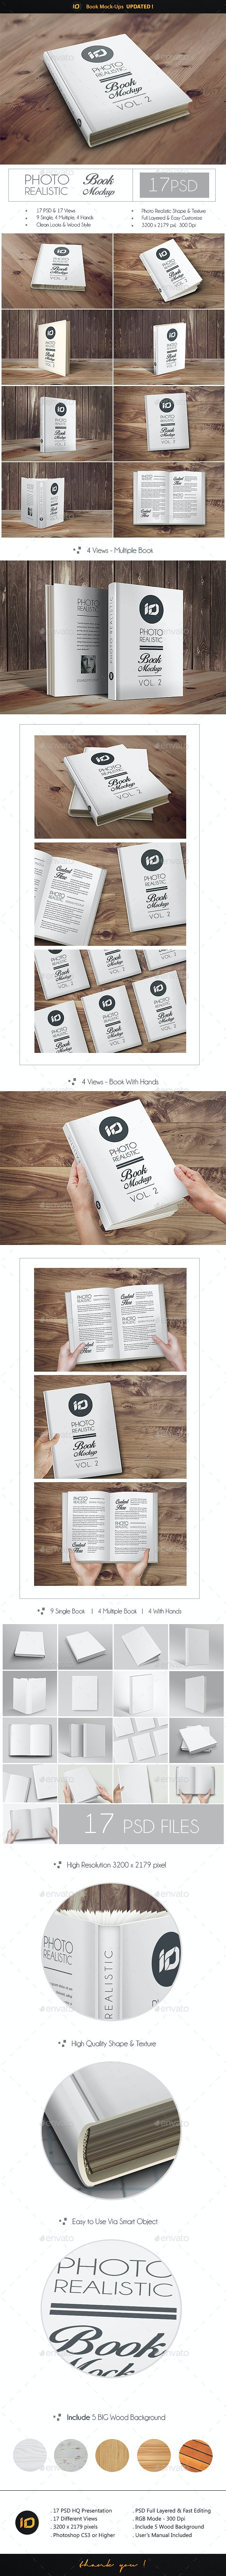 ID Book Mock-Up Photorealistic - Books Print